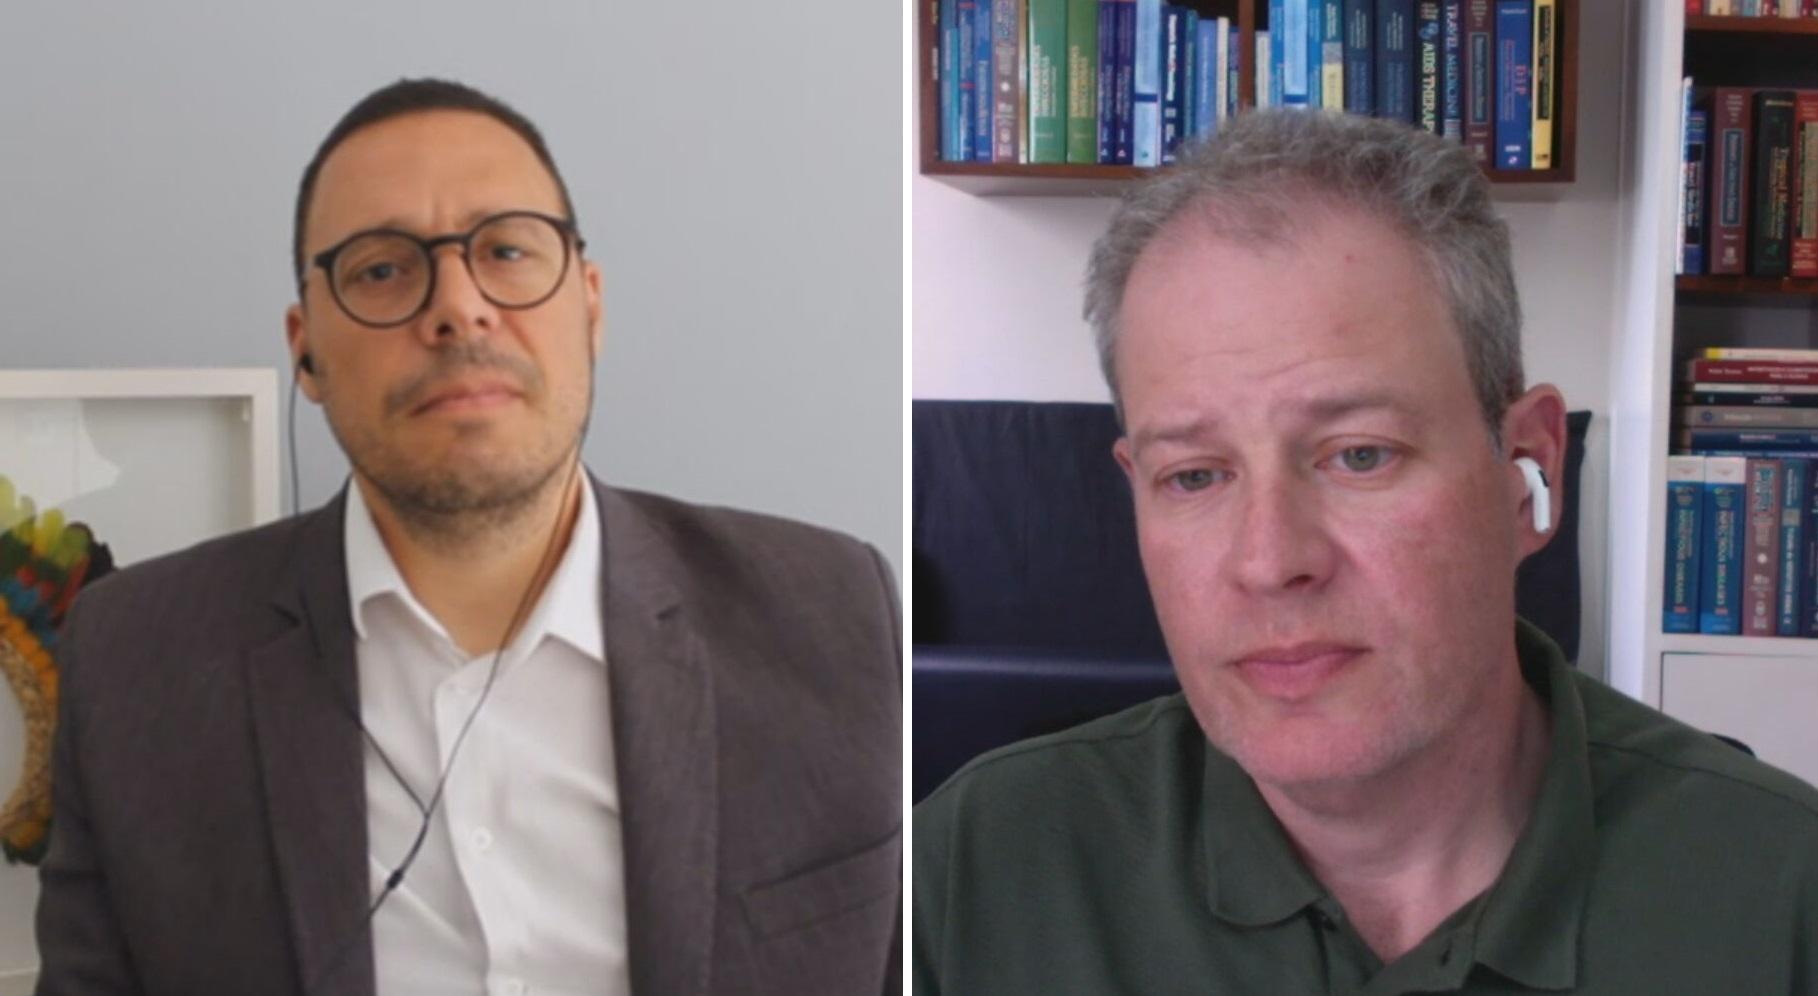 Julio Croda, infectologista e pesquisador da FioCruz, e Sergio Cimerman Presiden